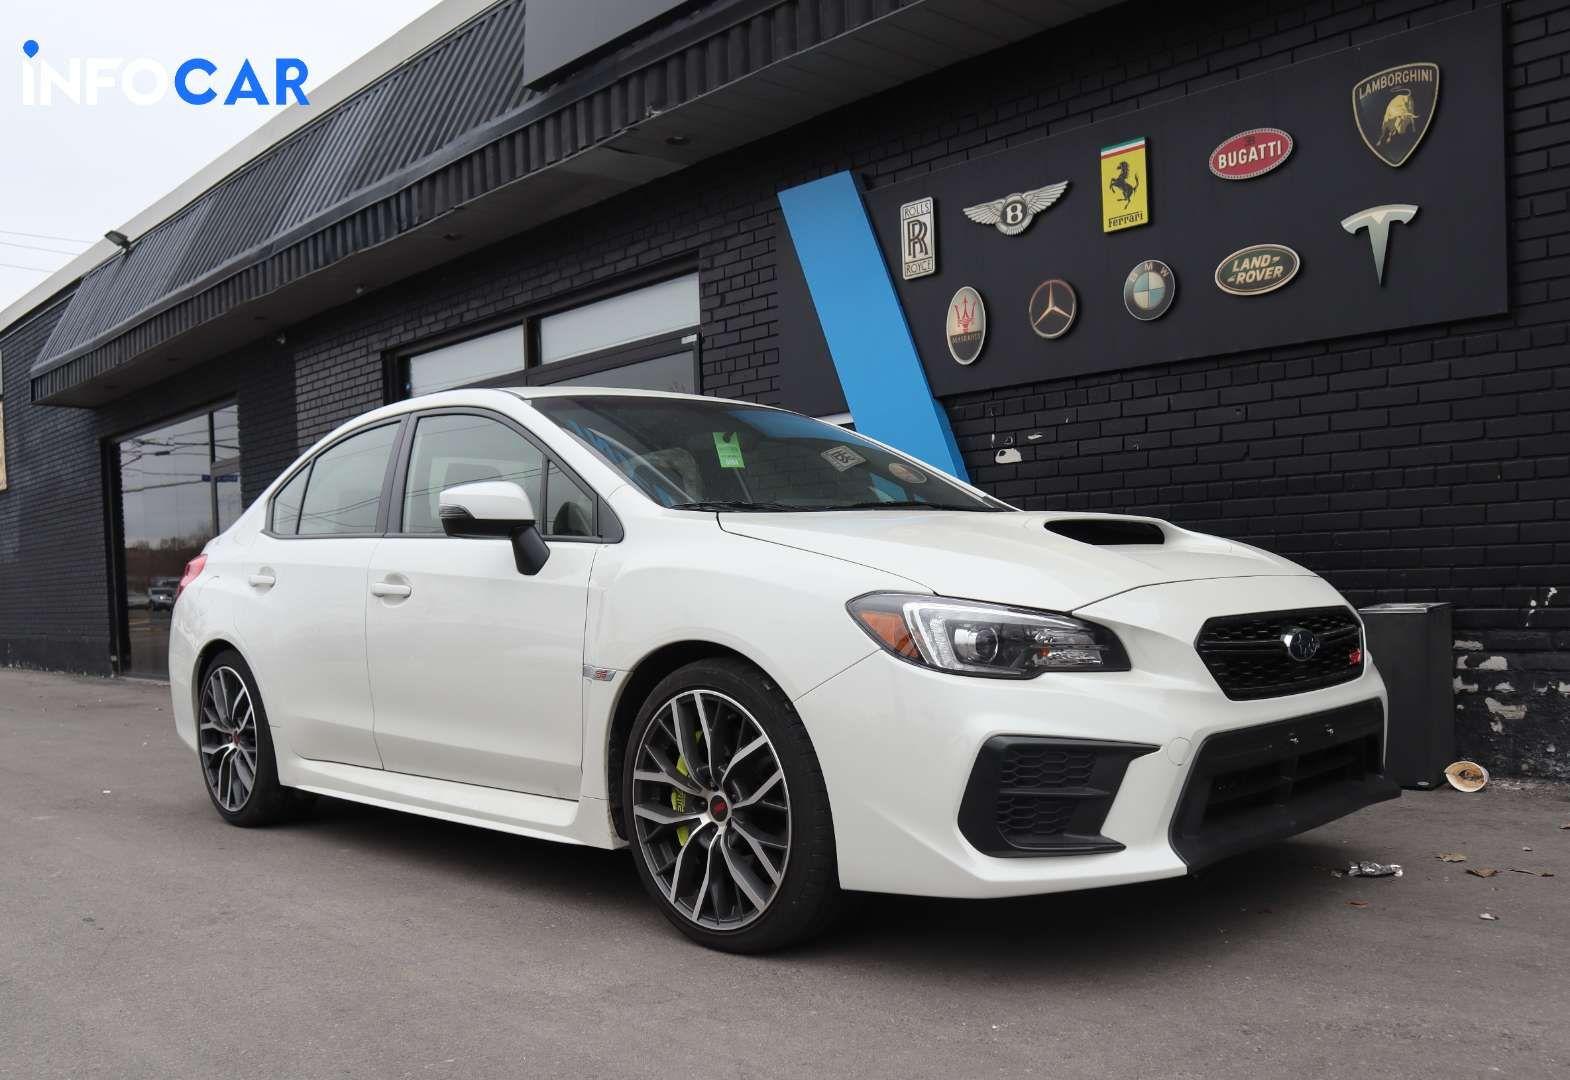 2020 Subaru WRX STI  SPORT-TE - INFOCAR - Toronto's Most Comprehensive New and Used Auto Trading Platform